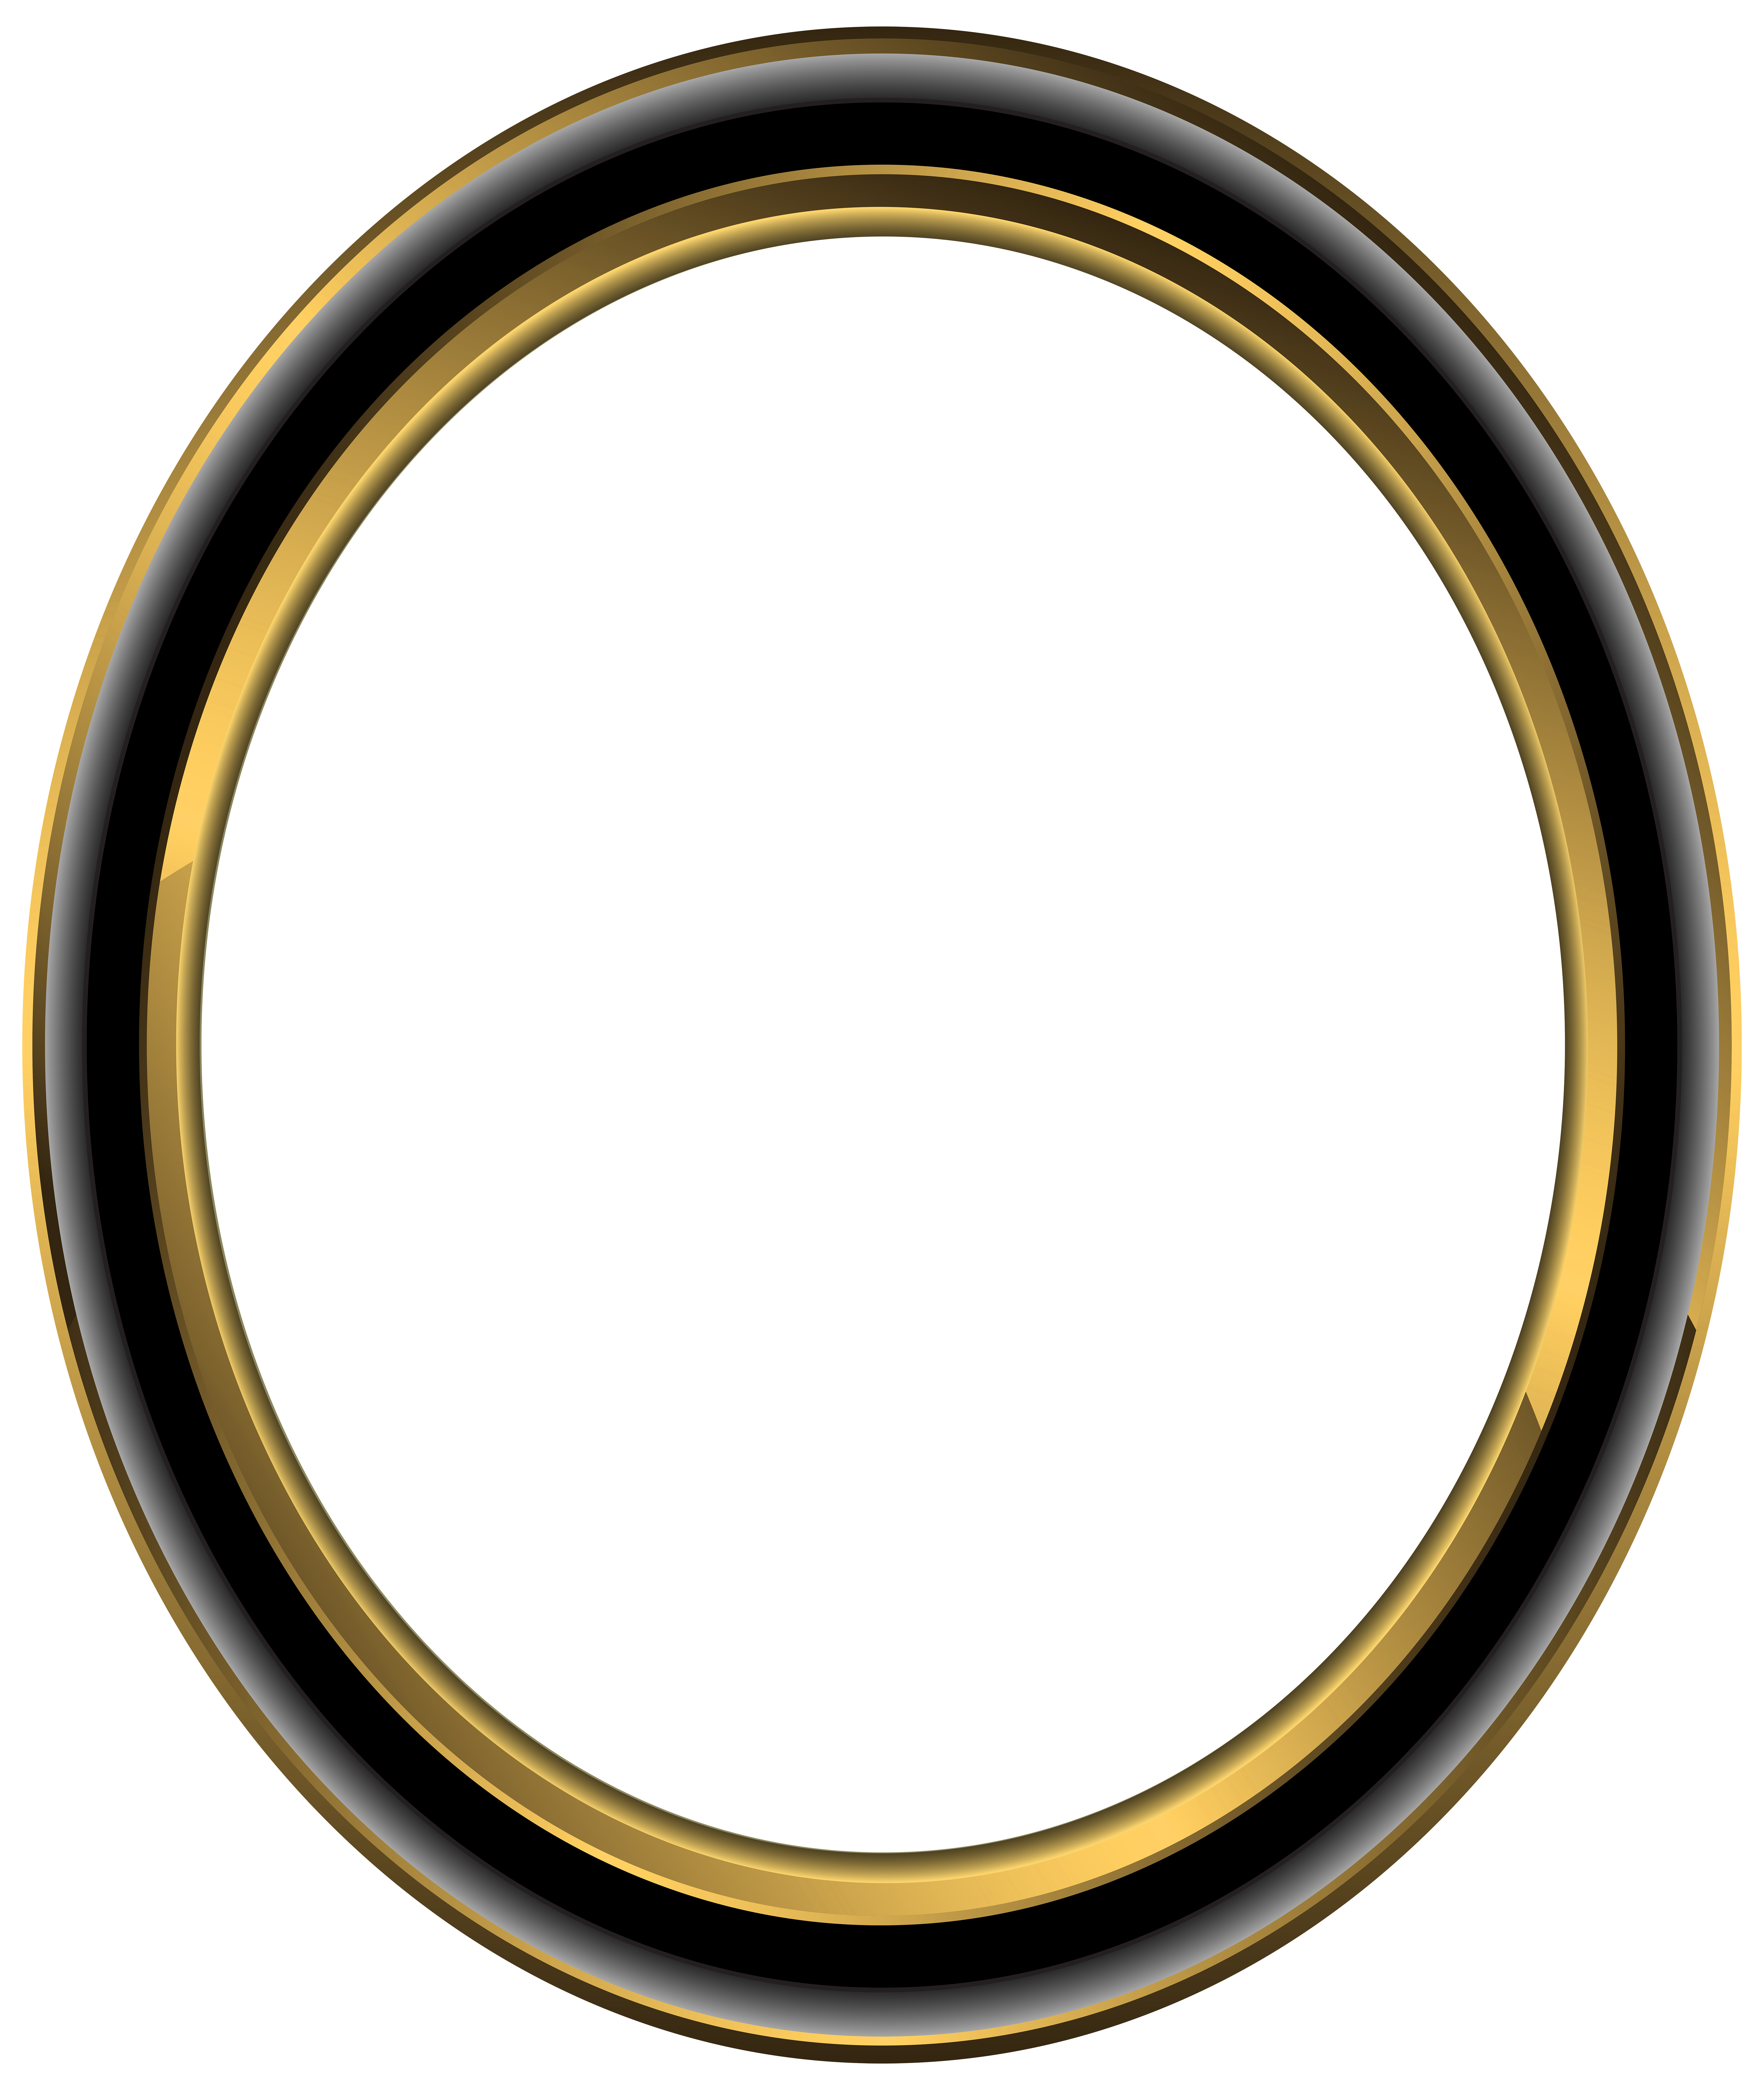 Oval picture frame png. Frametransparent image gallery yopriceville